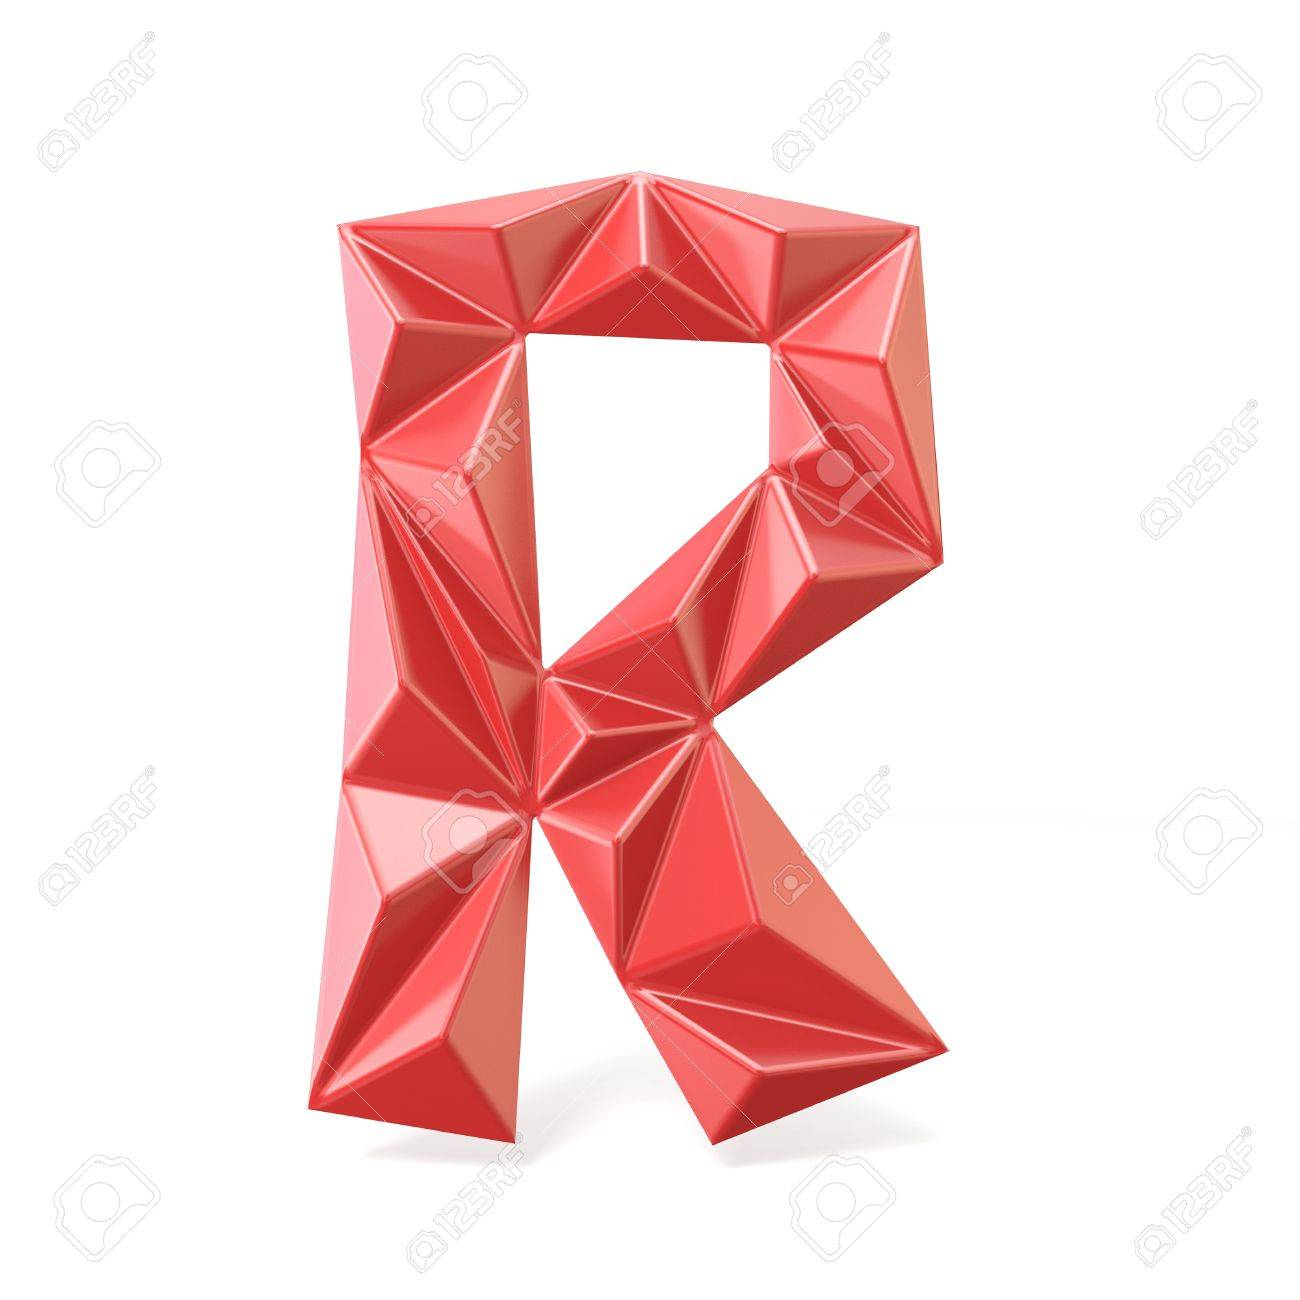 red modern triangular font letter r 3d render illustration isolated